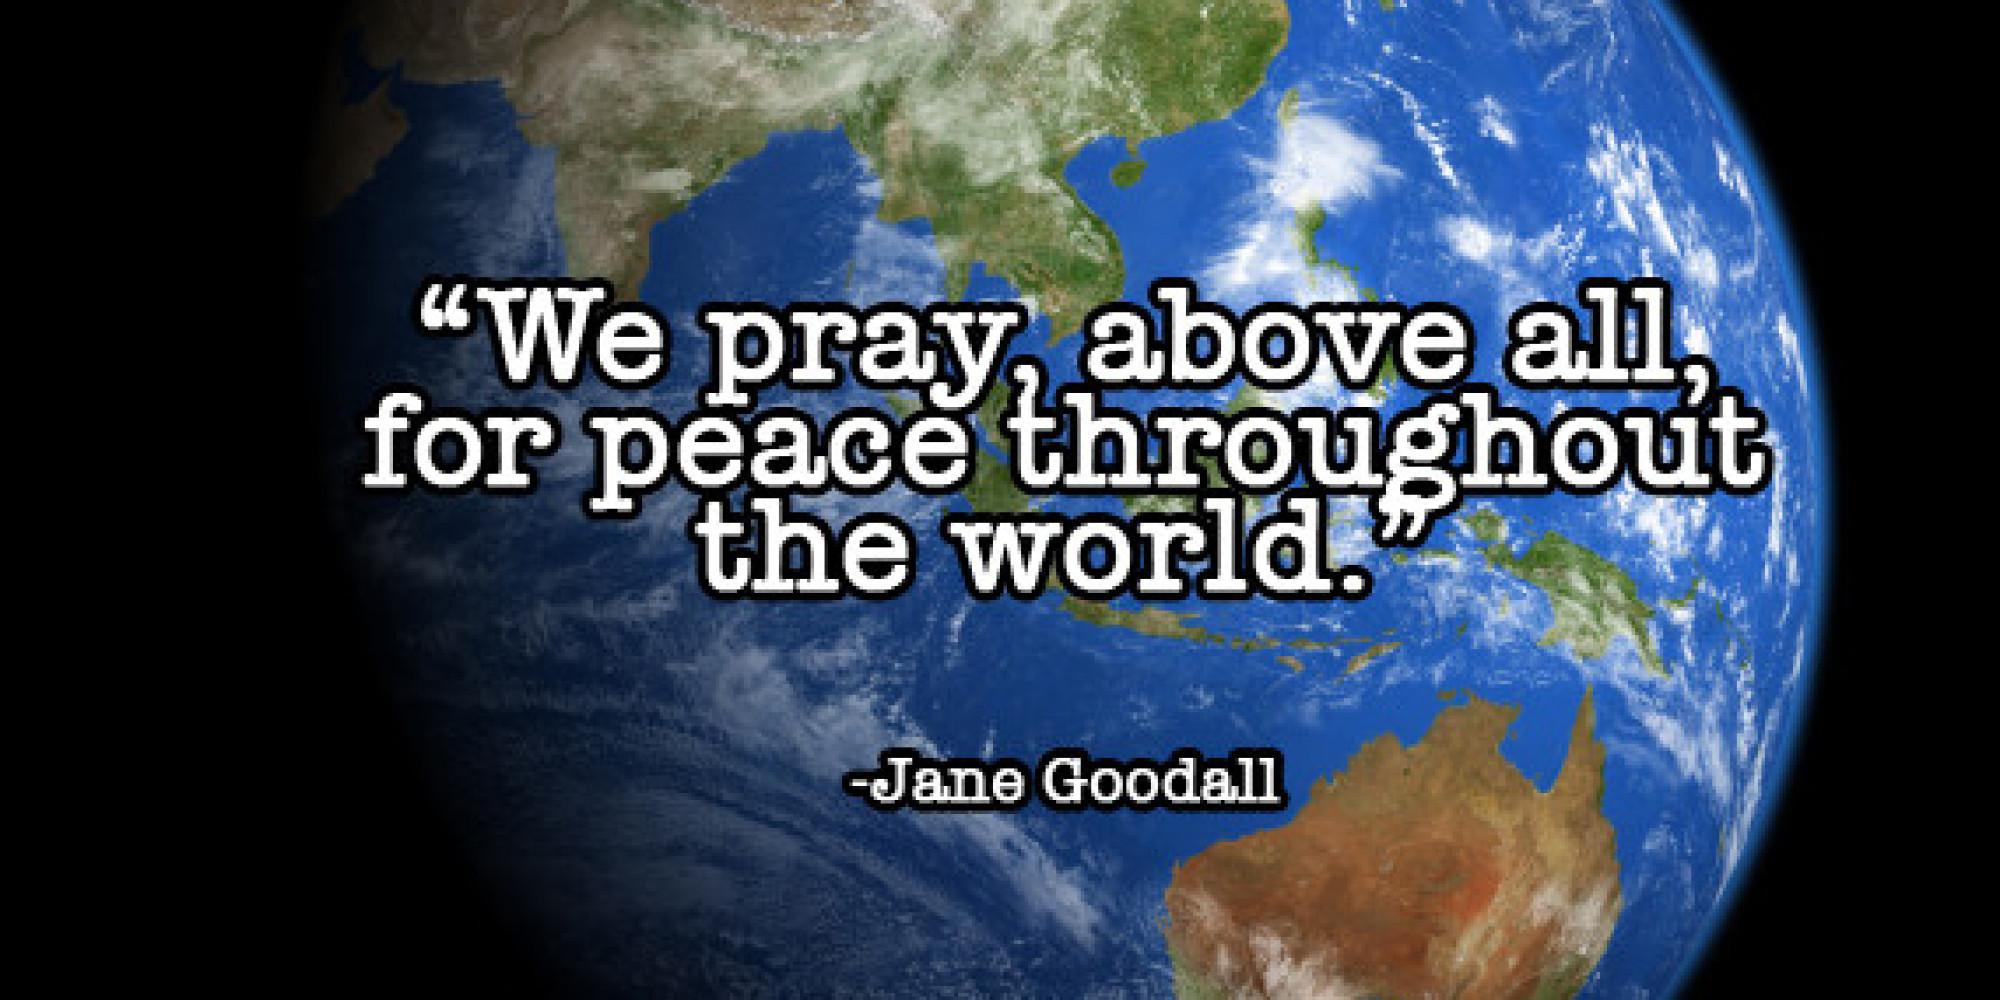 Berühmt Daily Meditation: Pray For World Peace | HuffPost DI42